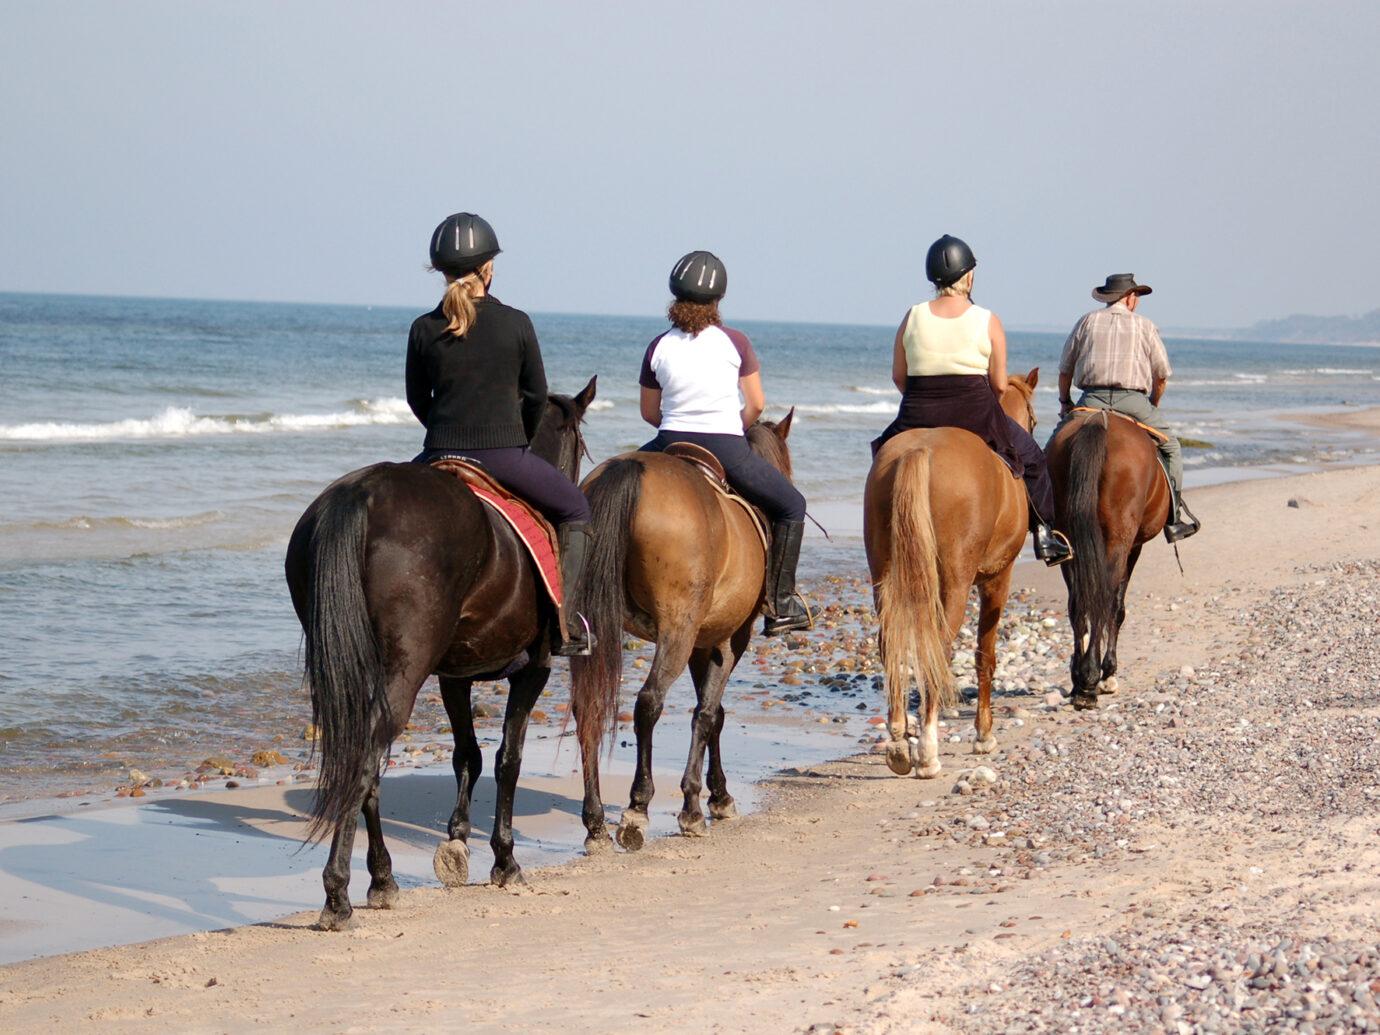 Beach horse-riding in summertime